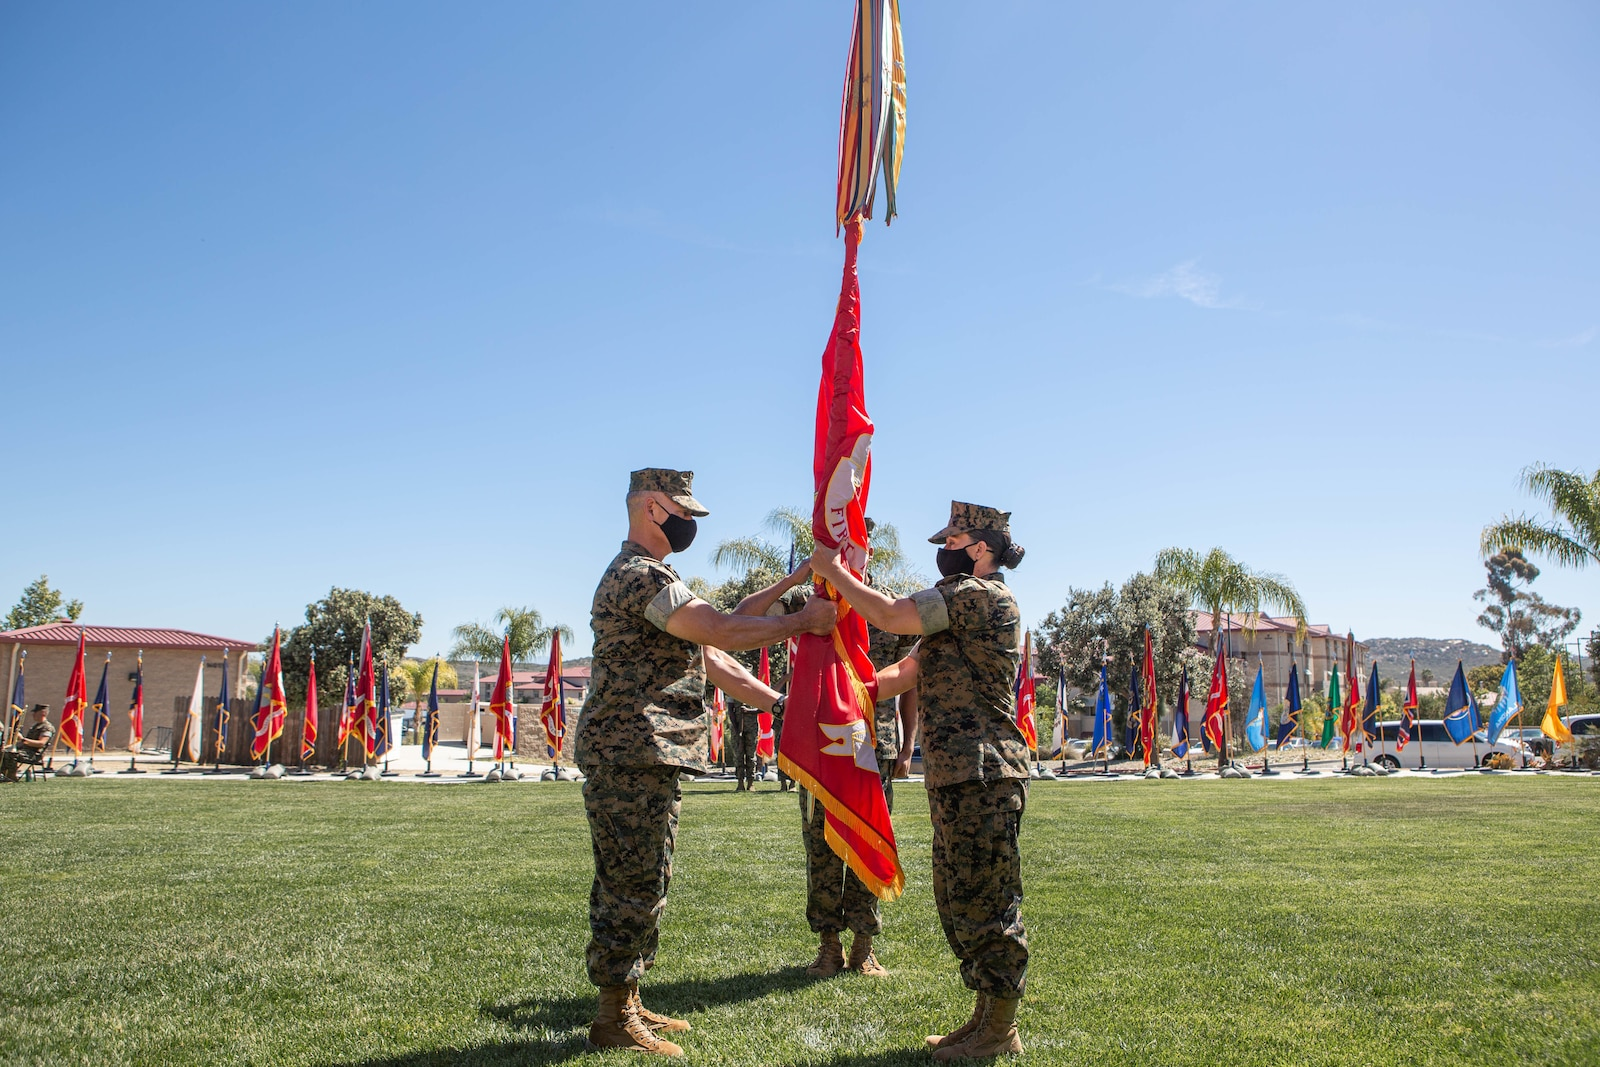 U.S. Marine Corps Brig. Gen. Bobbi Shea, U.S. Marine Corps Brig. Gen. Bobbi Shea, exchange the Group colors during the 1st Marine Logistics Group change of command ceremony.